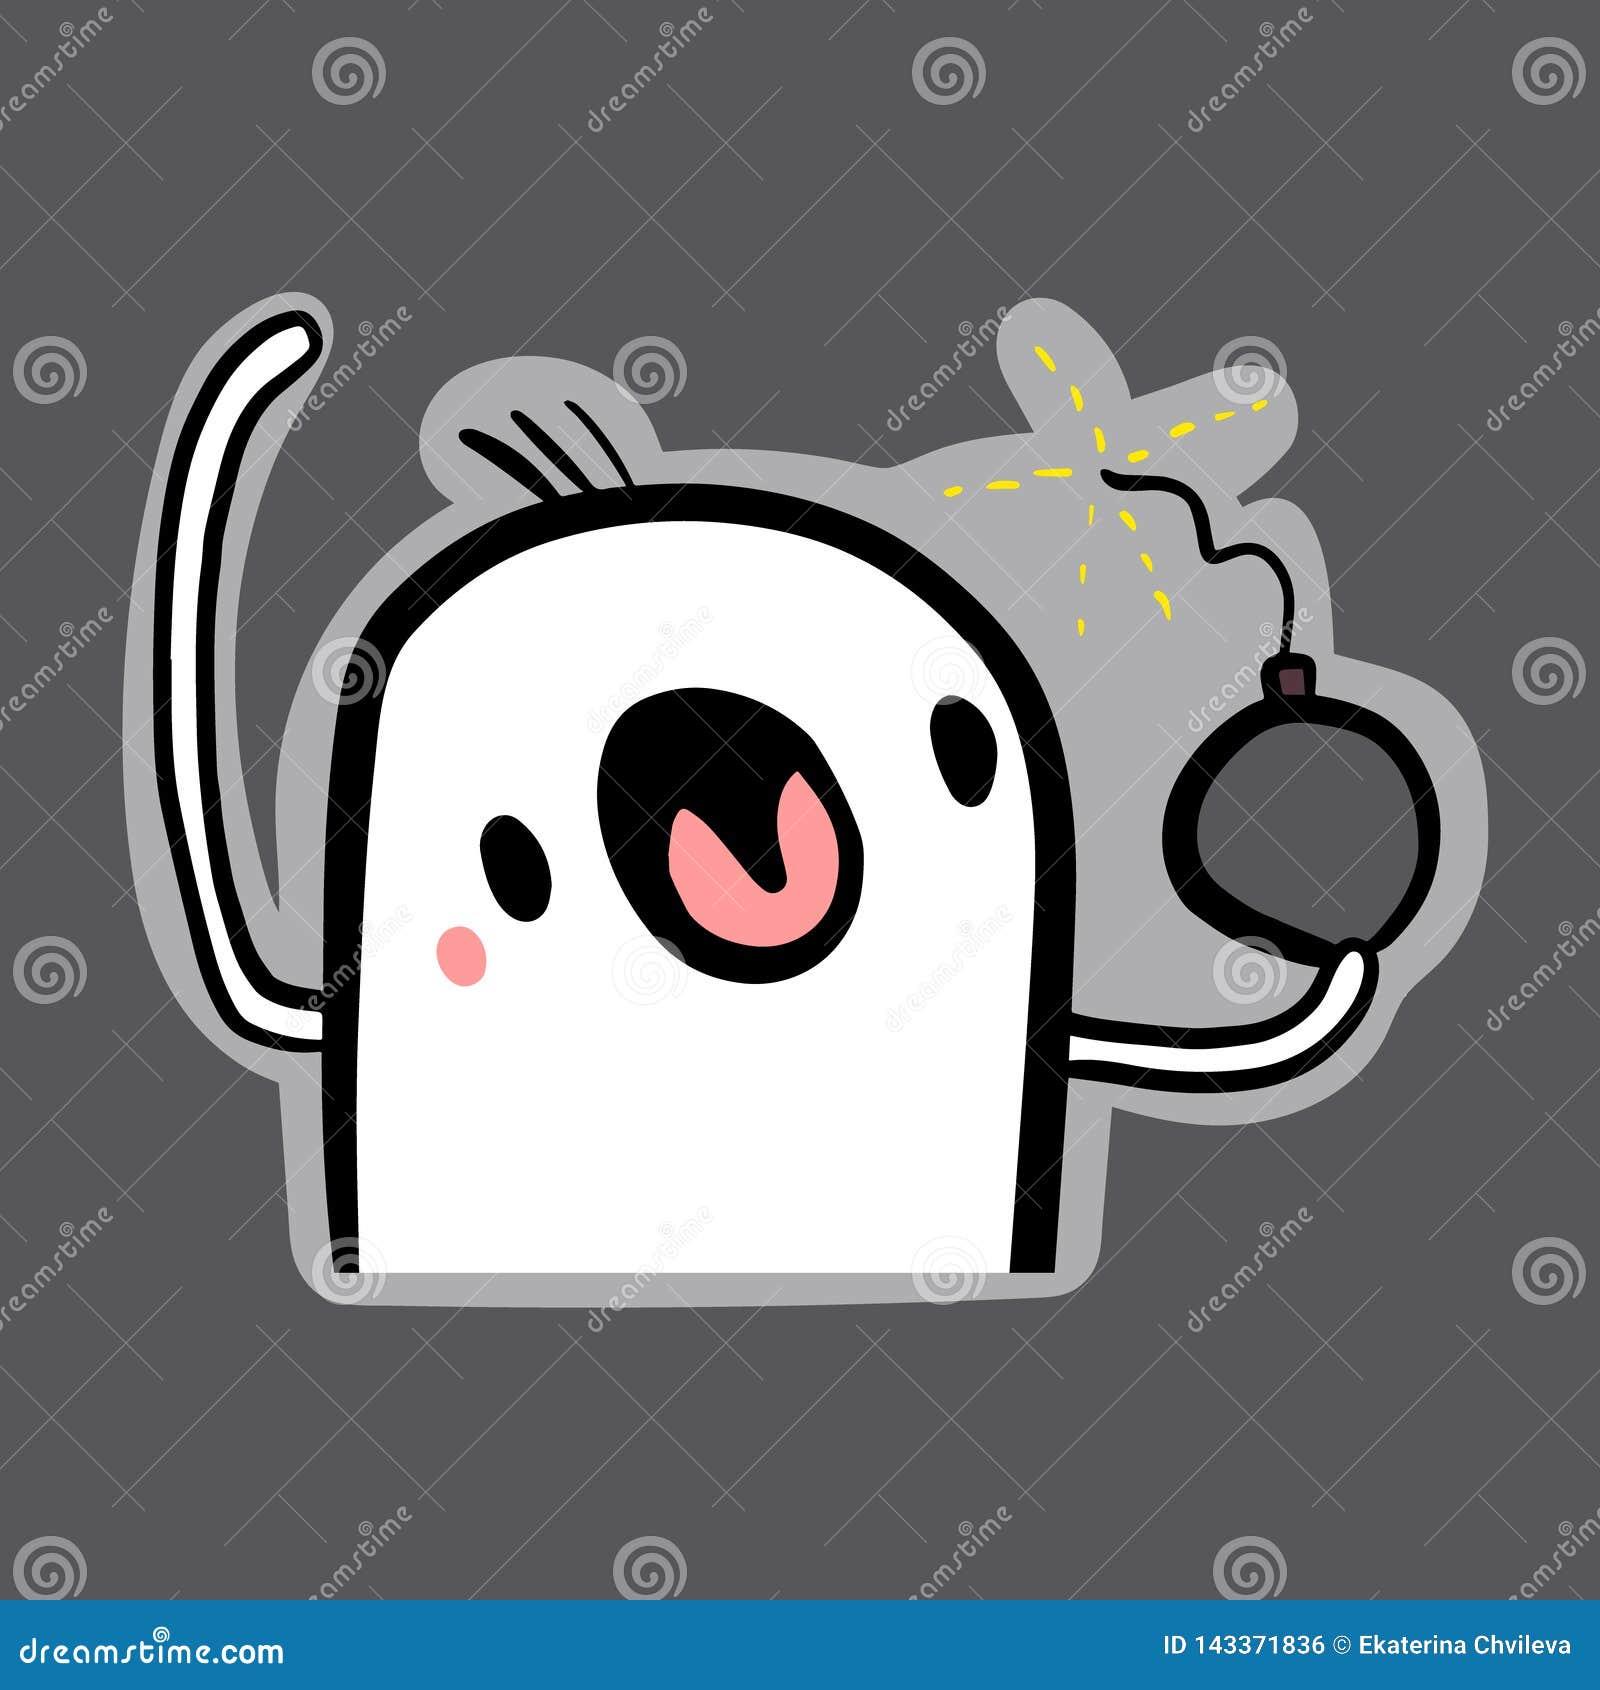 Cute marshmallow holding bomb hand drawn illustration sticker in cartoon style